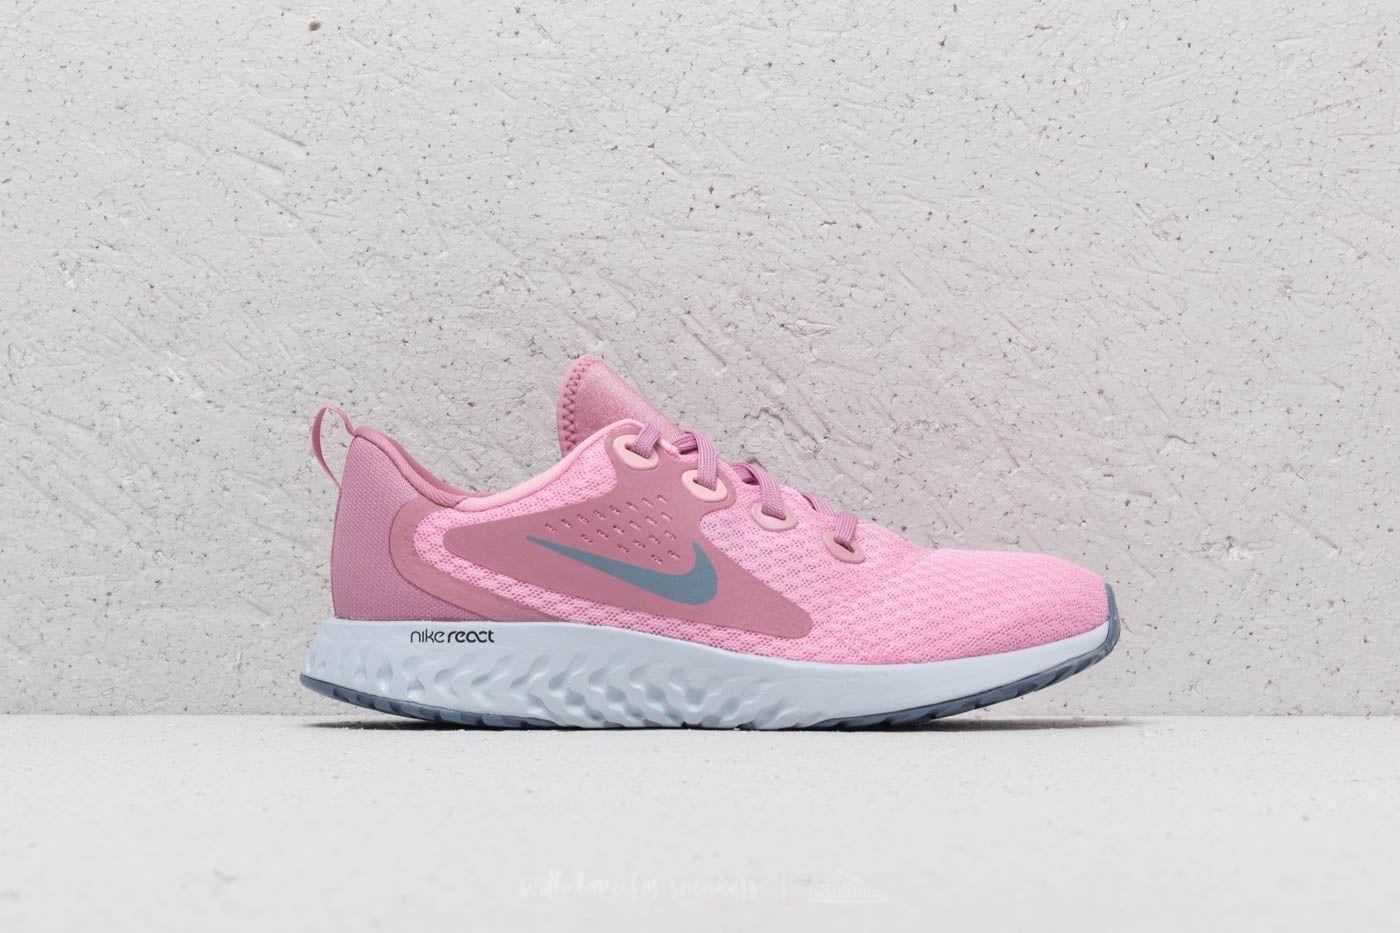 huge selection of 009df 70209 Nike Legend React (GS) Pink Ashen Slate fashion shoes shoesaddict  schuhe design boots runningshoes sneakers footwear foot footgear ...